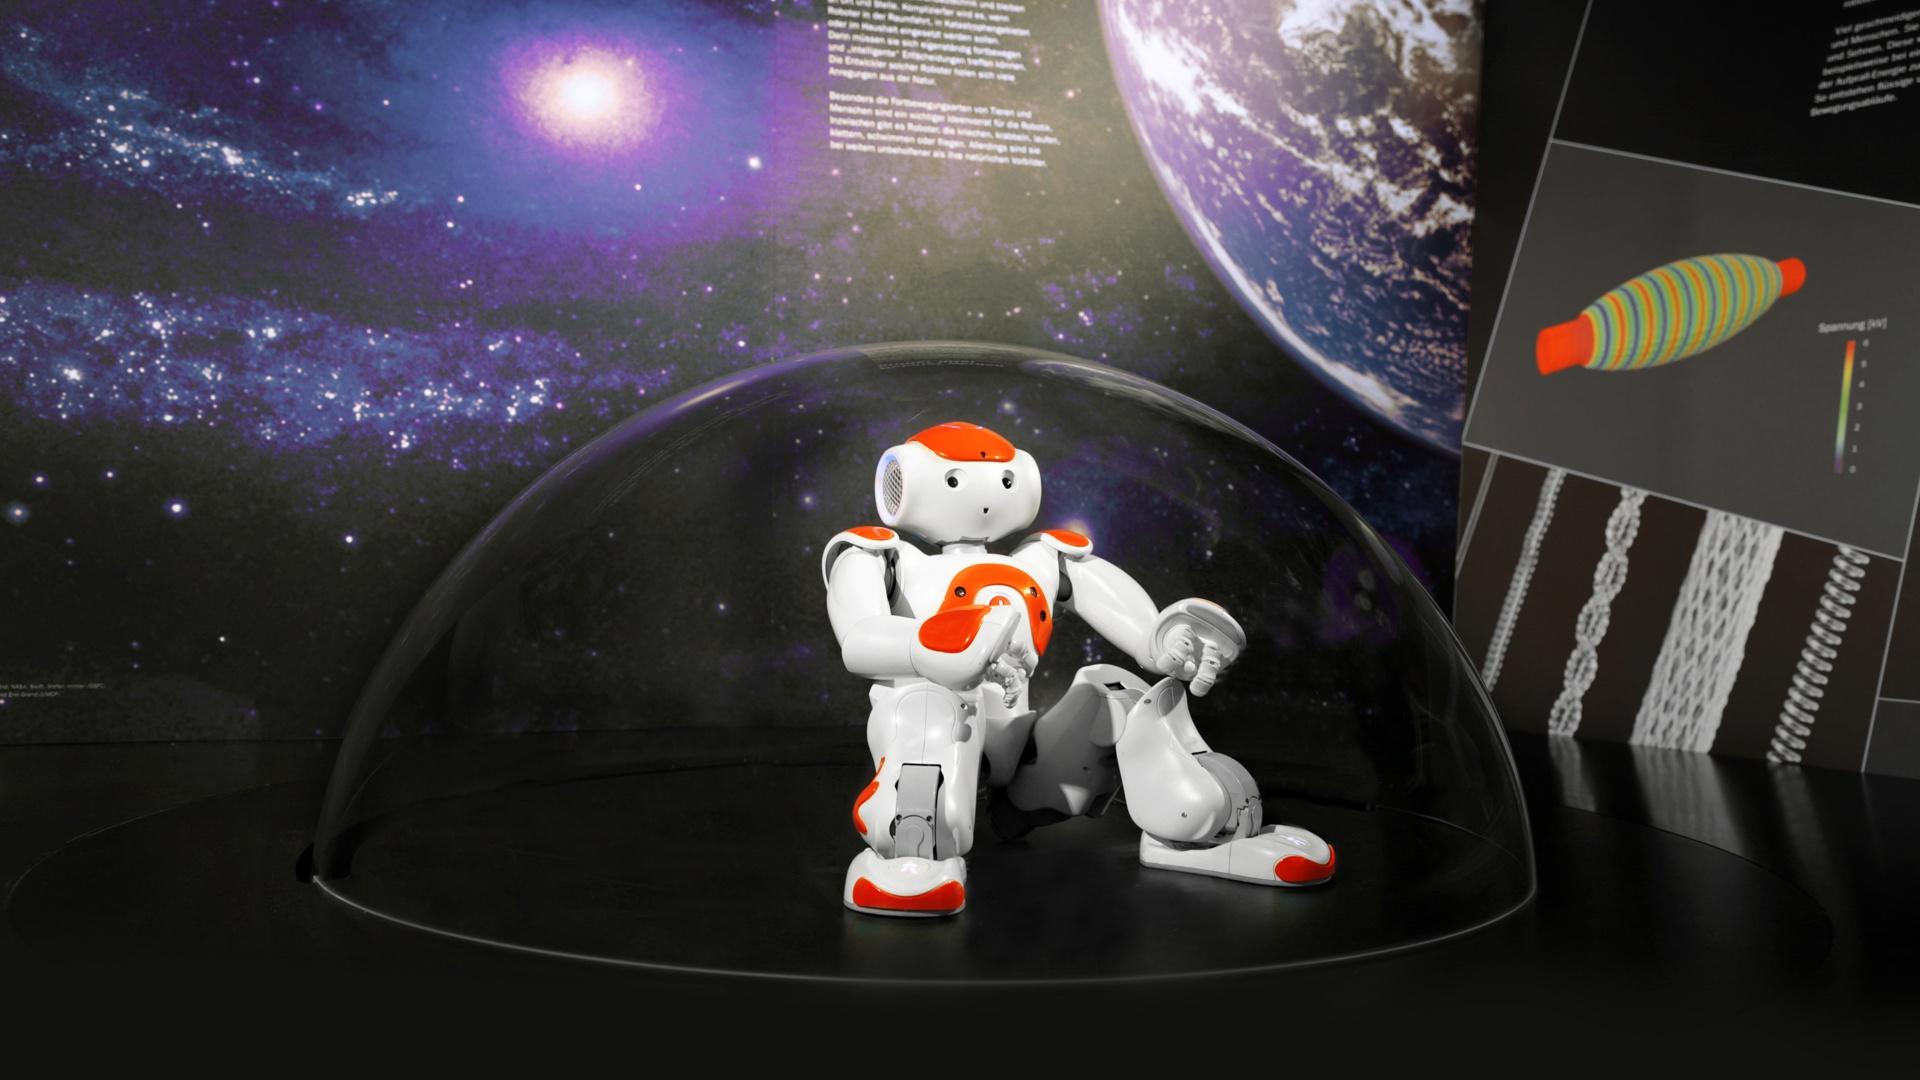 interaktive Exponate Roboter Nao Bionicum